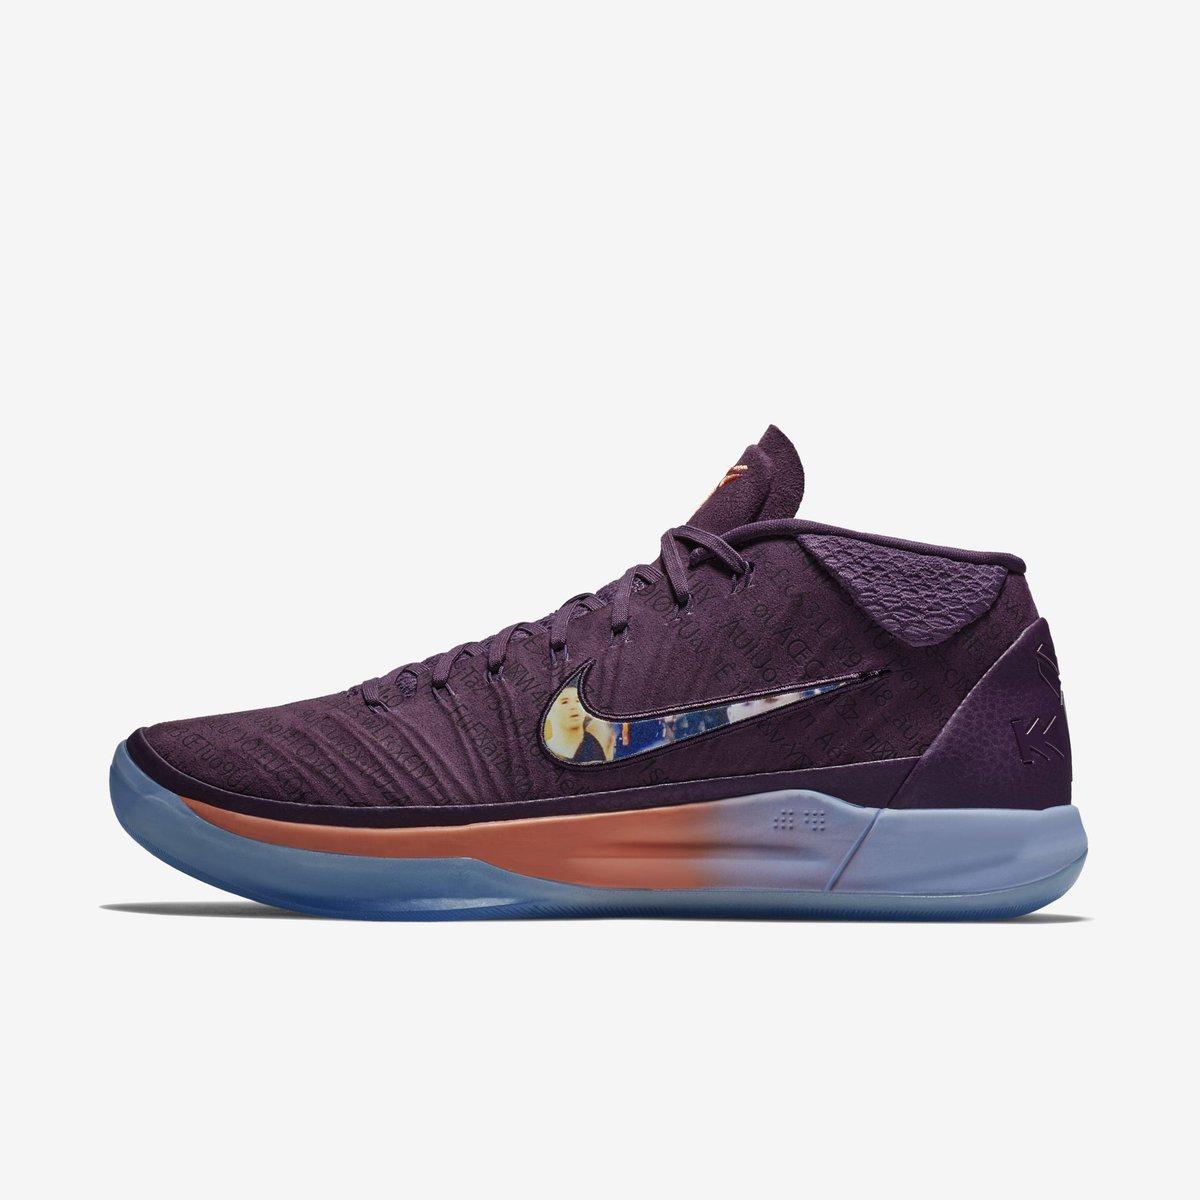 30b57eb83448 Sneakers Treasure on Twitter